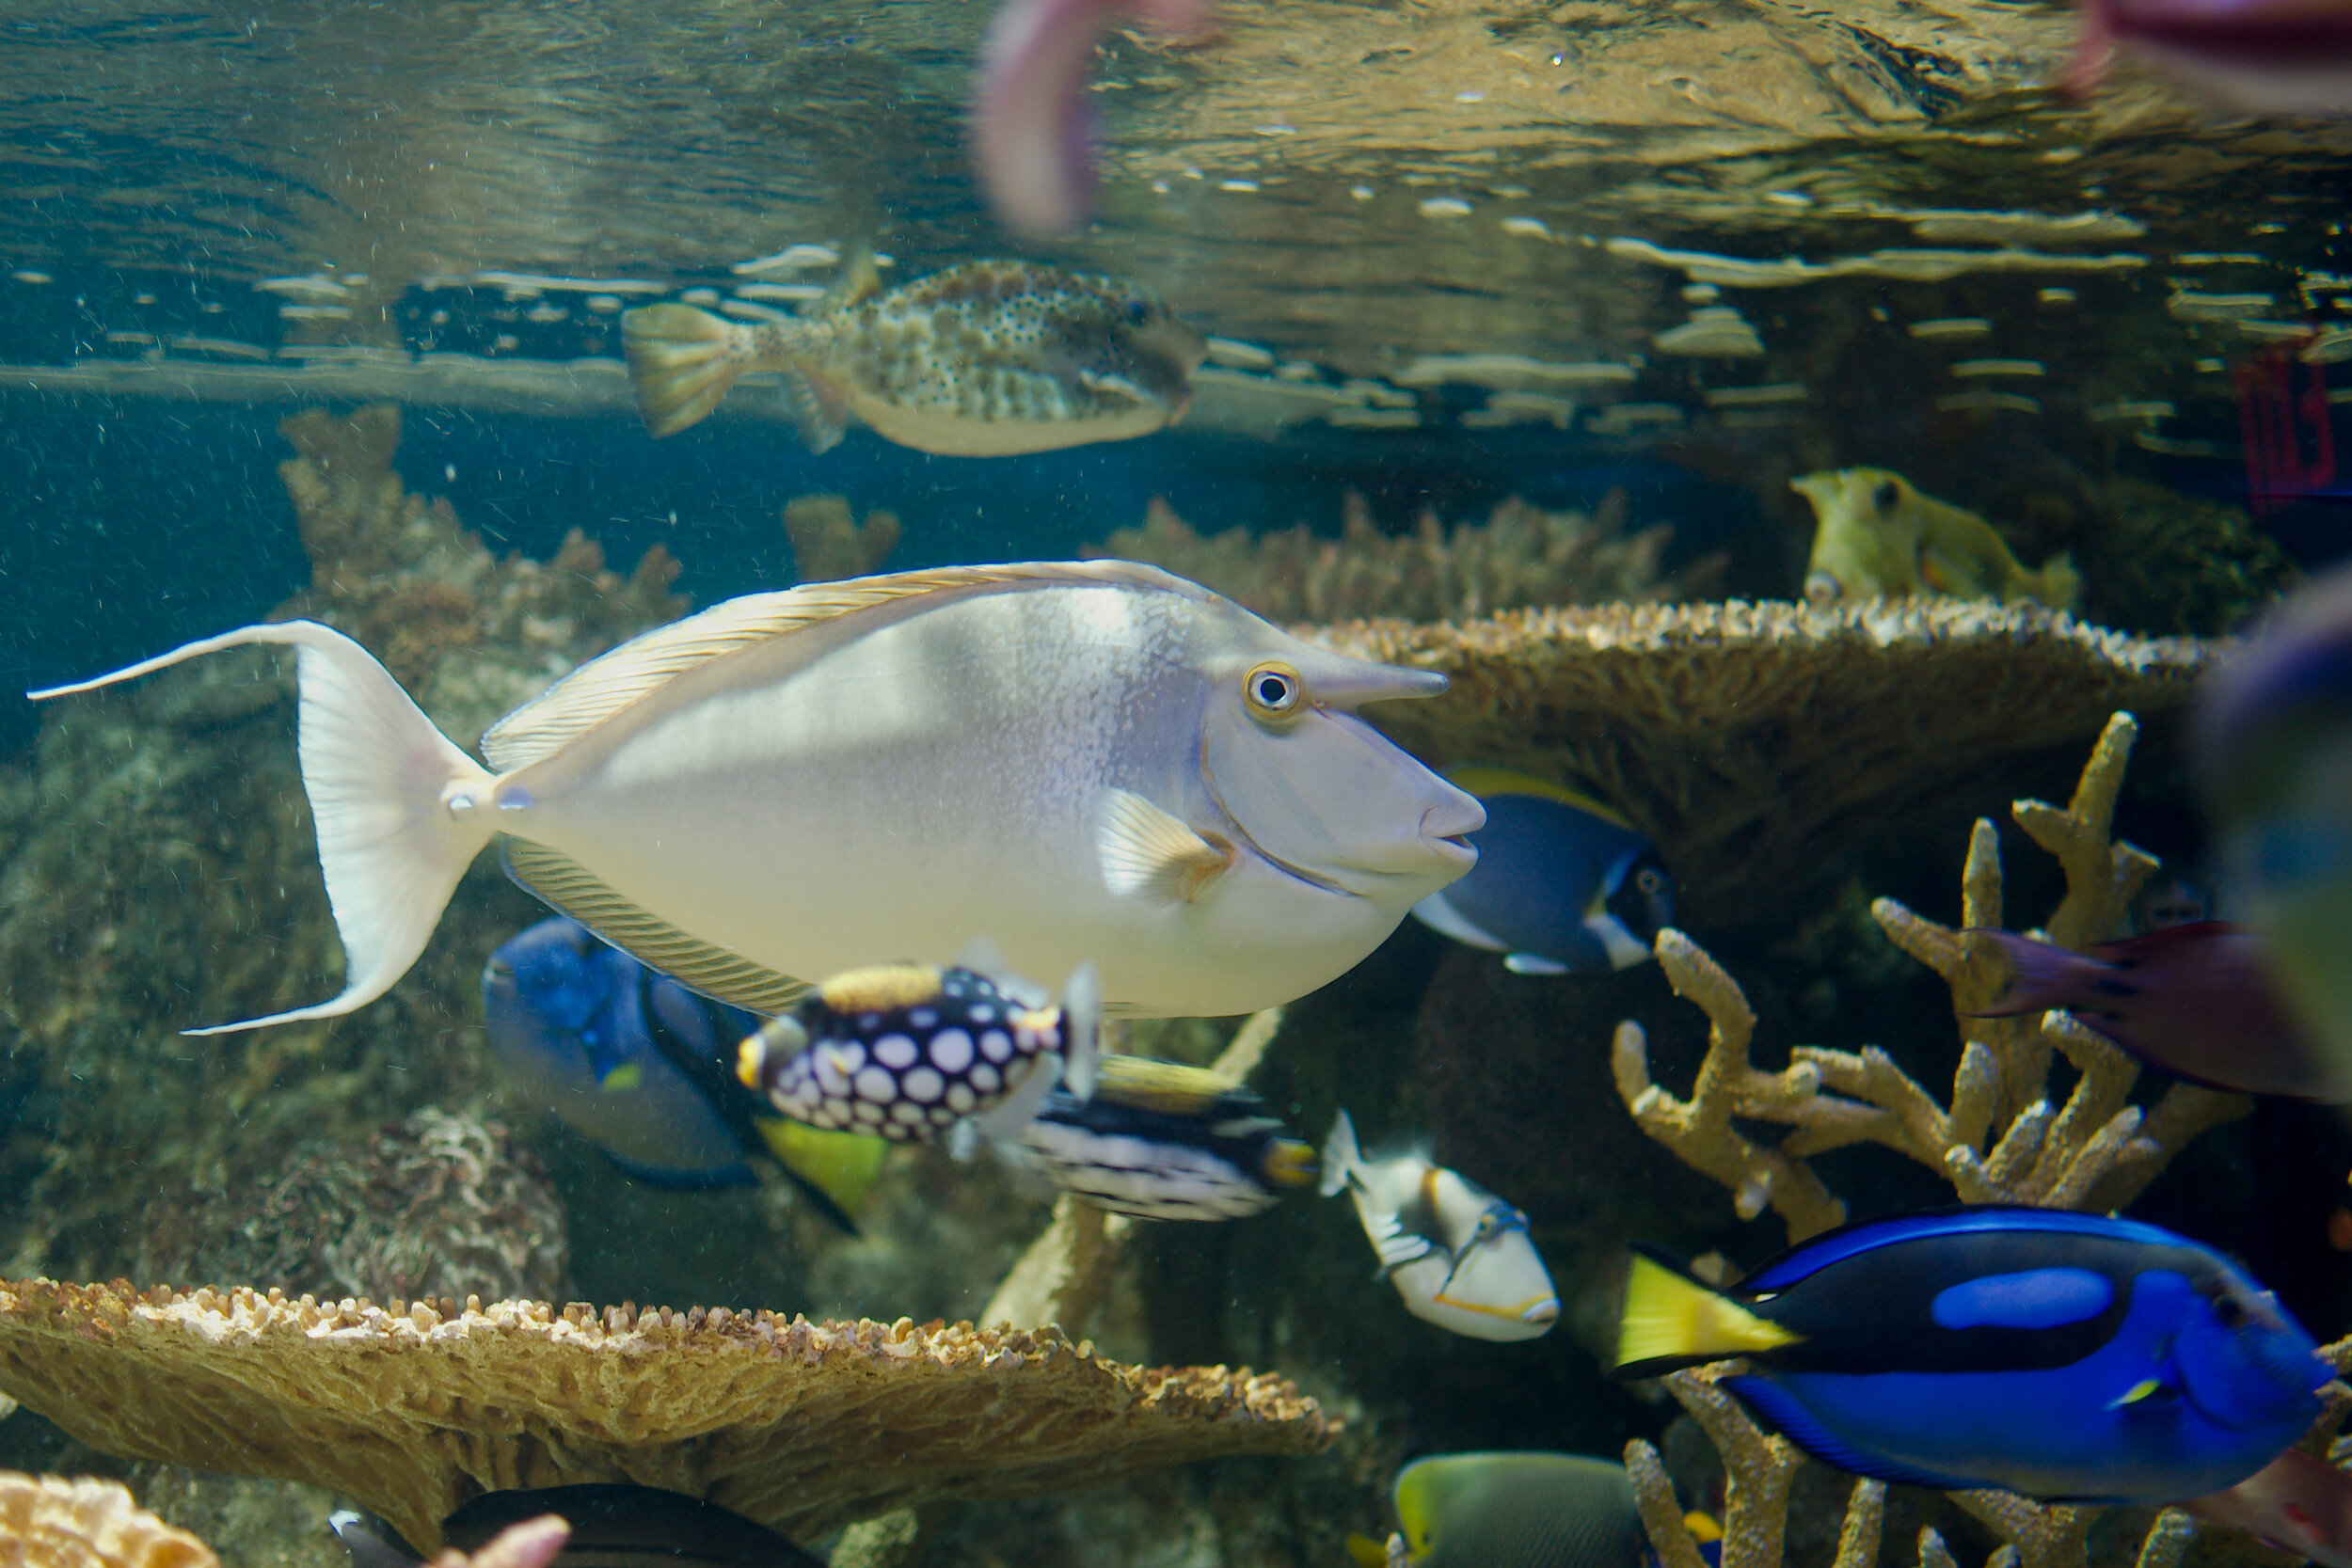 Blue-Spine_Unicornfish_(New_England_Aquarium).jpg